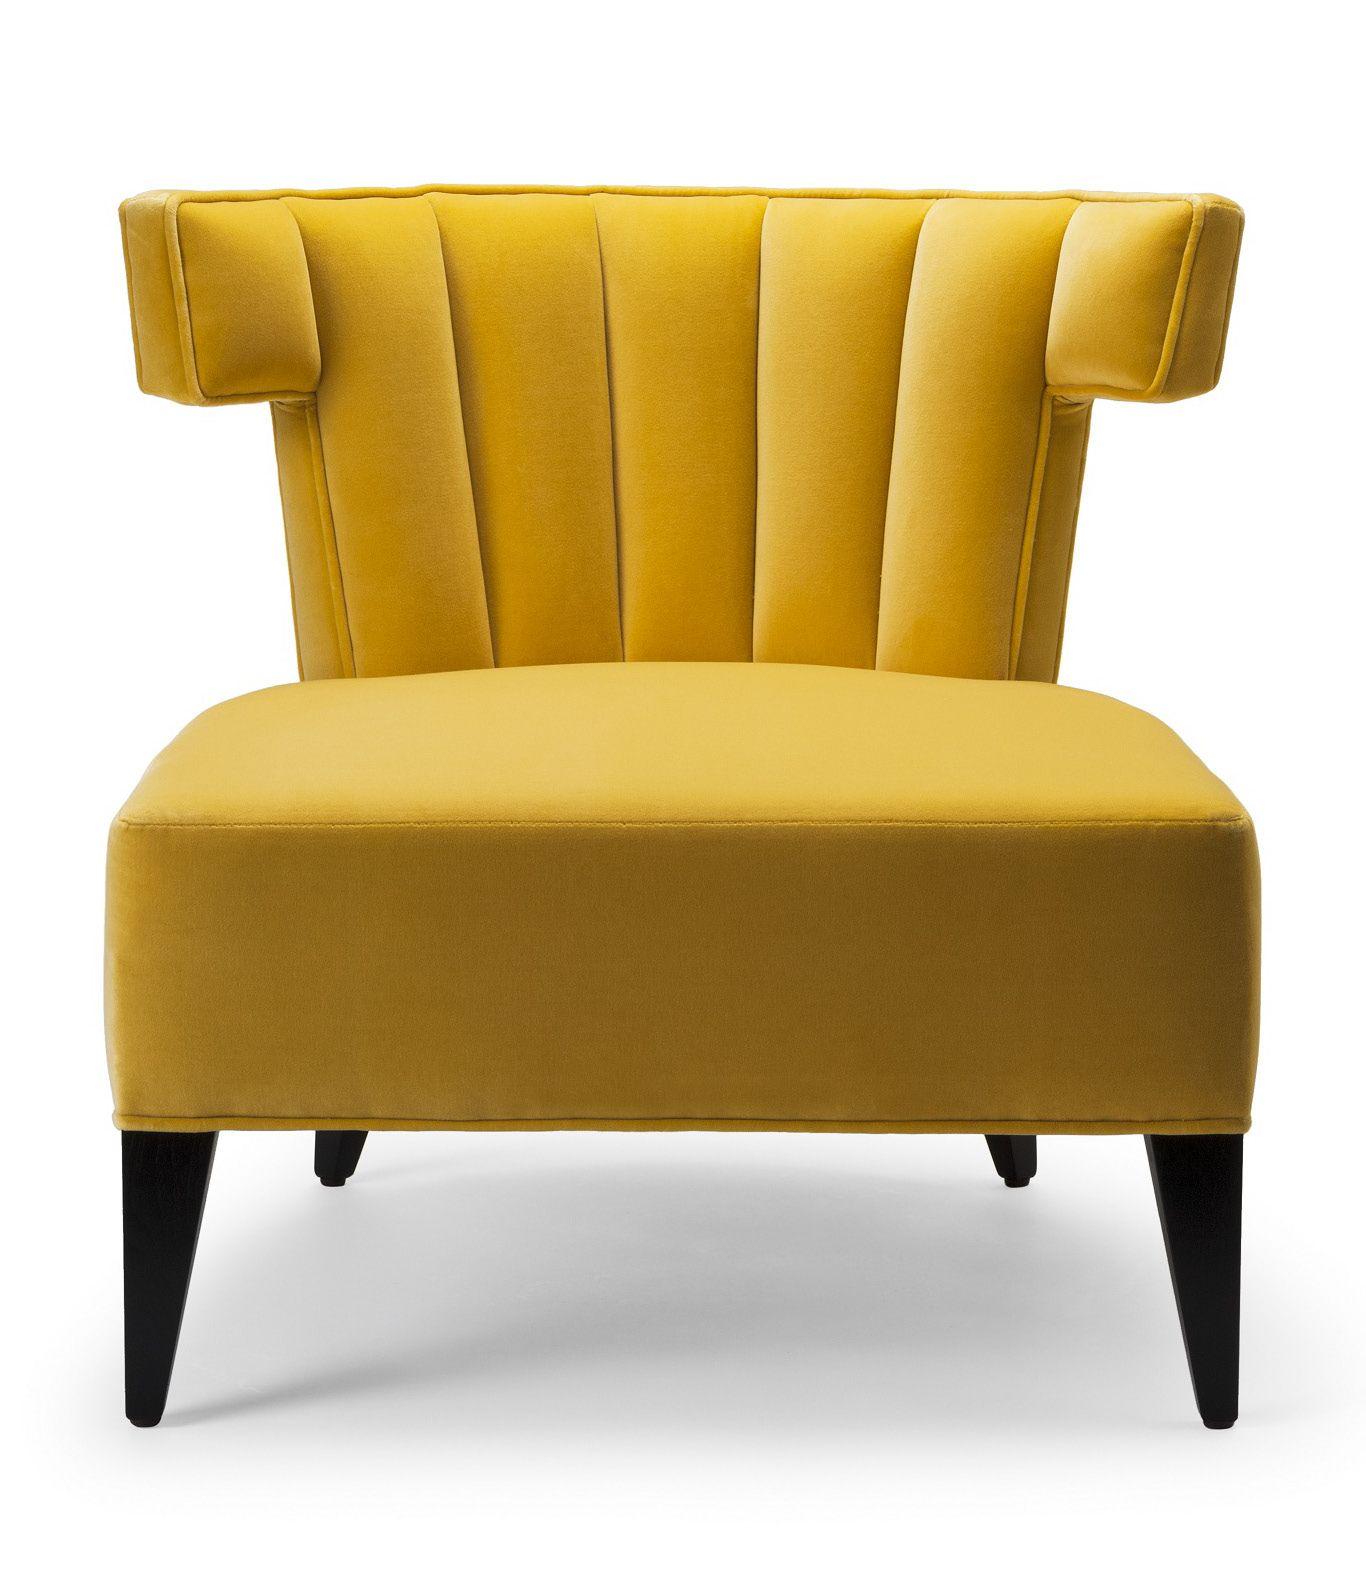 Handmade English Furniture. Isabella Slipper Chair   Stuart Scott  Associates Ltd